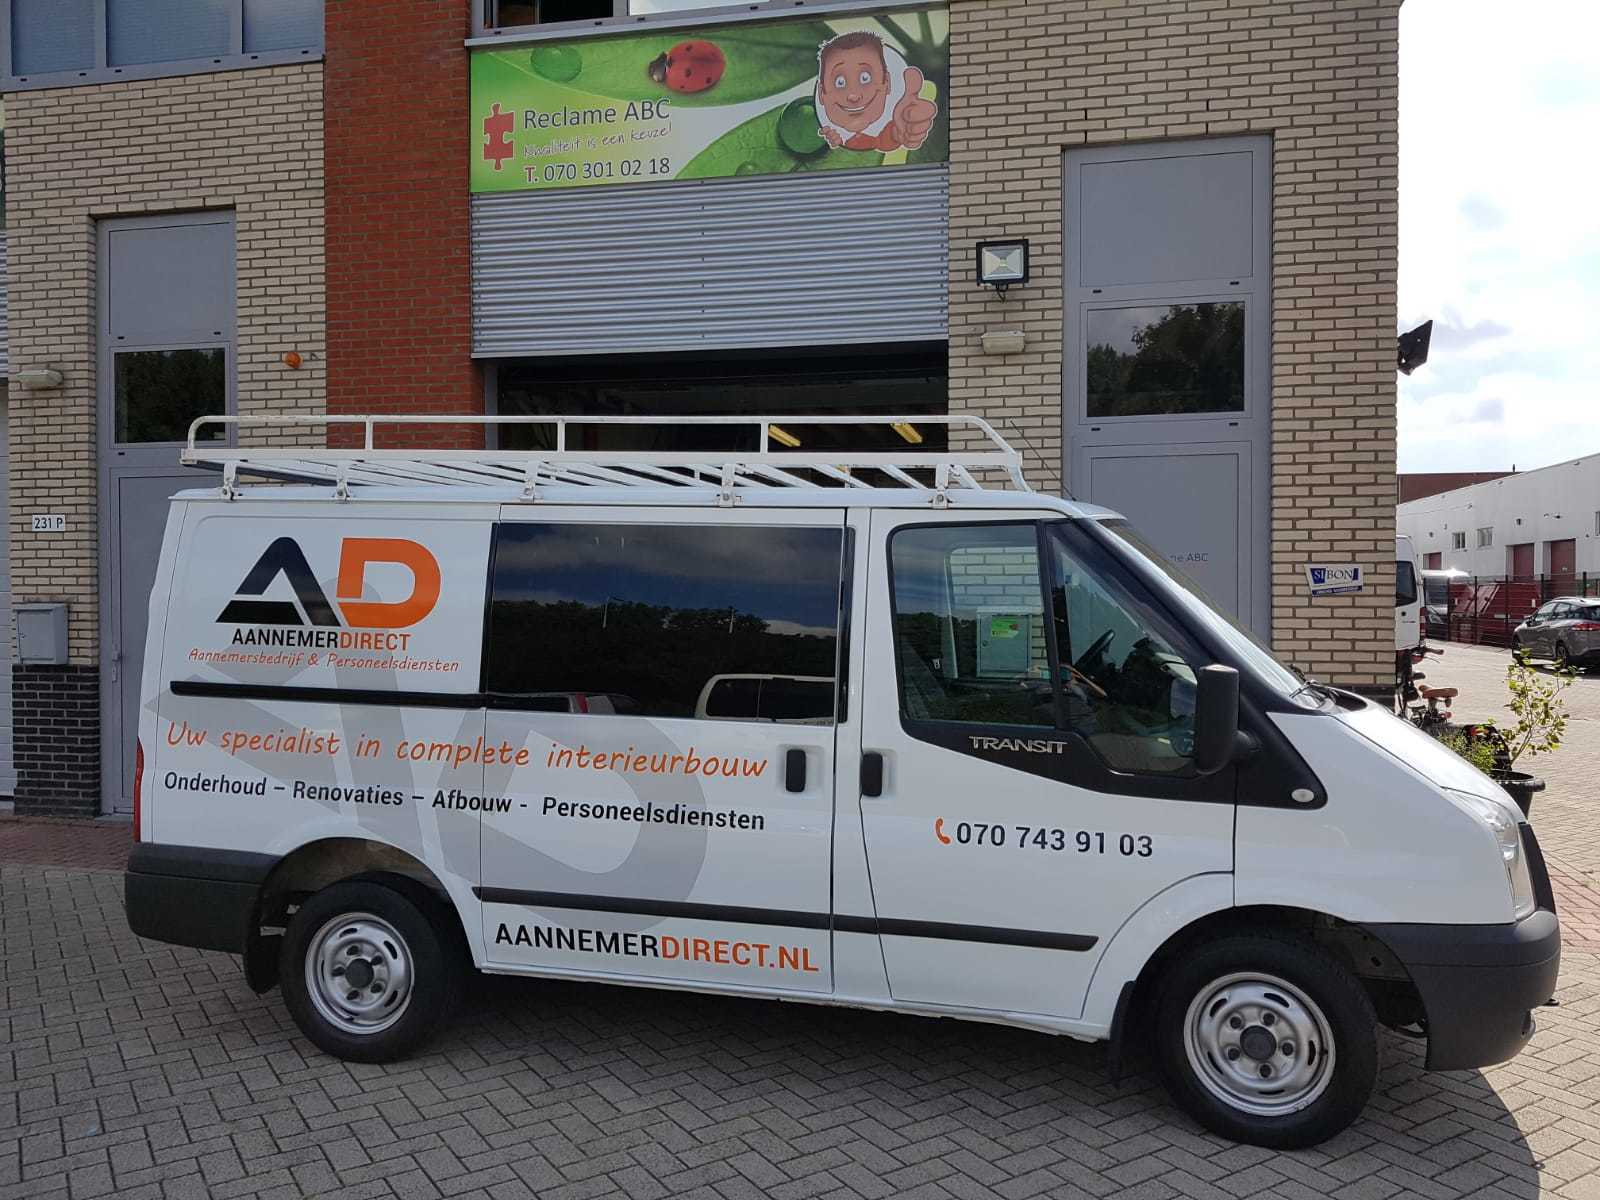 reclame-abc-autobelettering-aannemer-direct